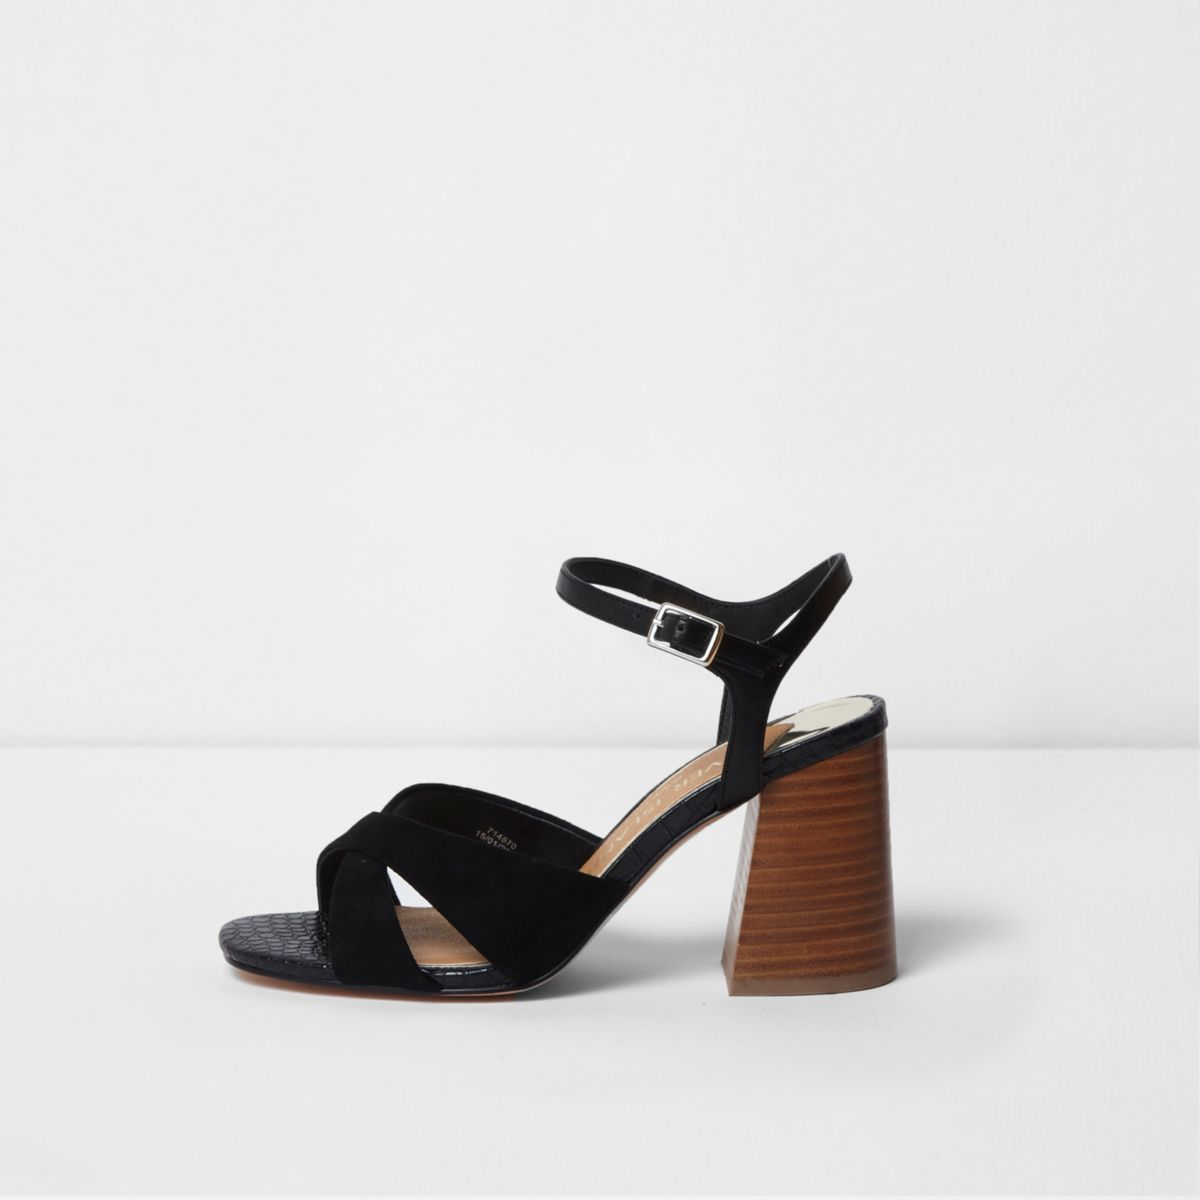 Zwarte sandalen met gekruiste bandjes, blokhak en brede pasvorm